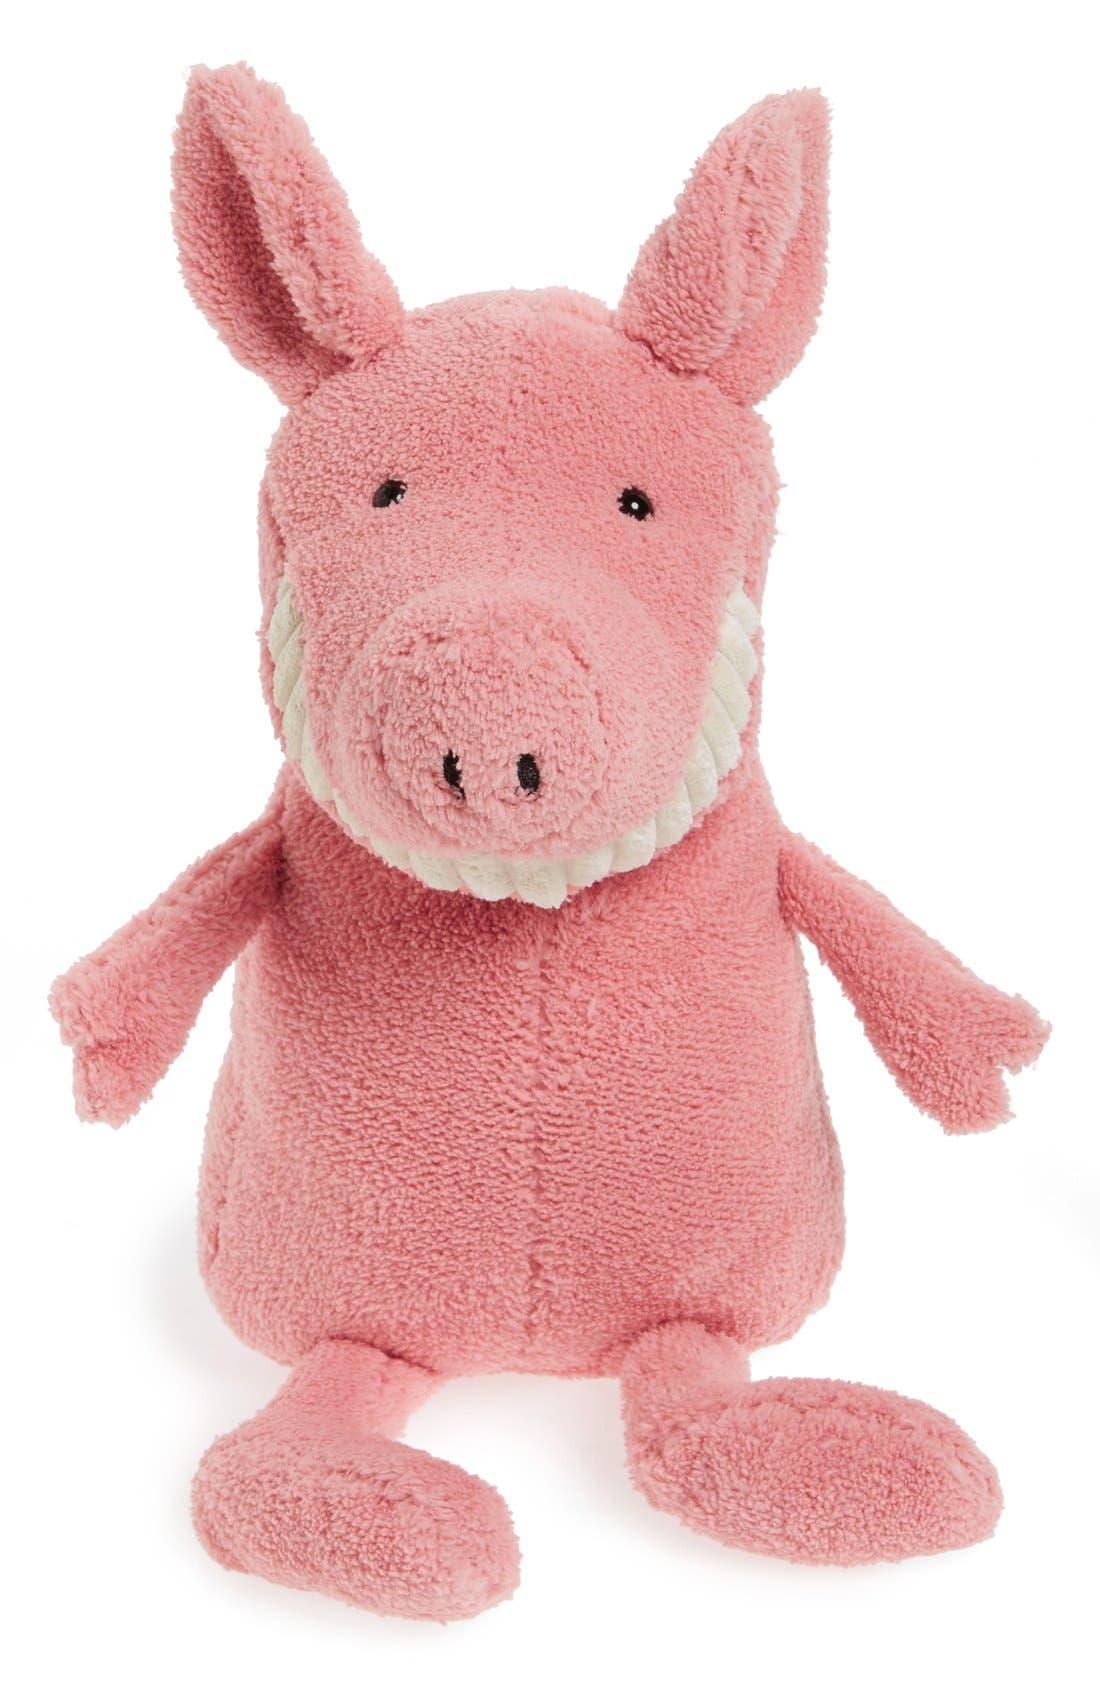 Main Image - Jellycat 'Medium Toothy Pig' Stuffed Animal